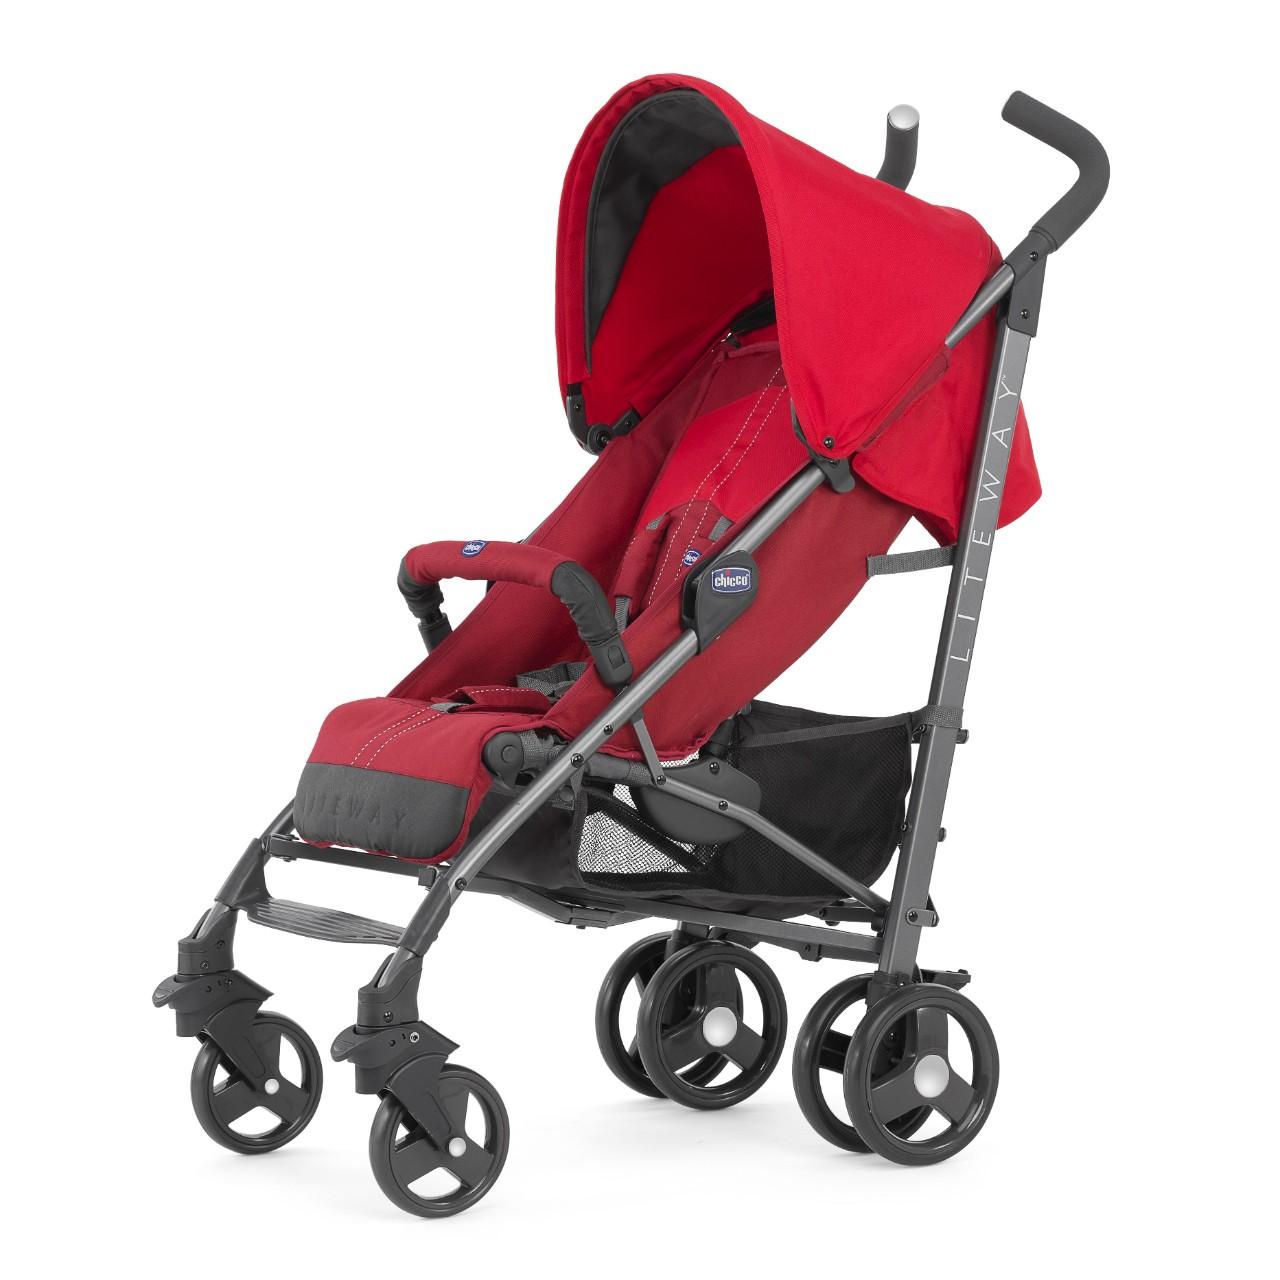 Nice Canopy Co Liteway Stroller Canopy Co Liteway Stroller Co Liteway Stroller Bambinos Wexford Co Liteway baby Chicco Liteway Plus